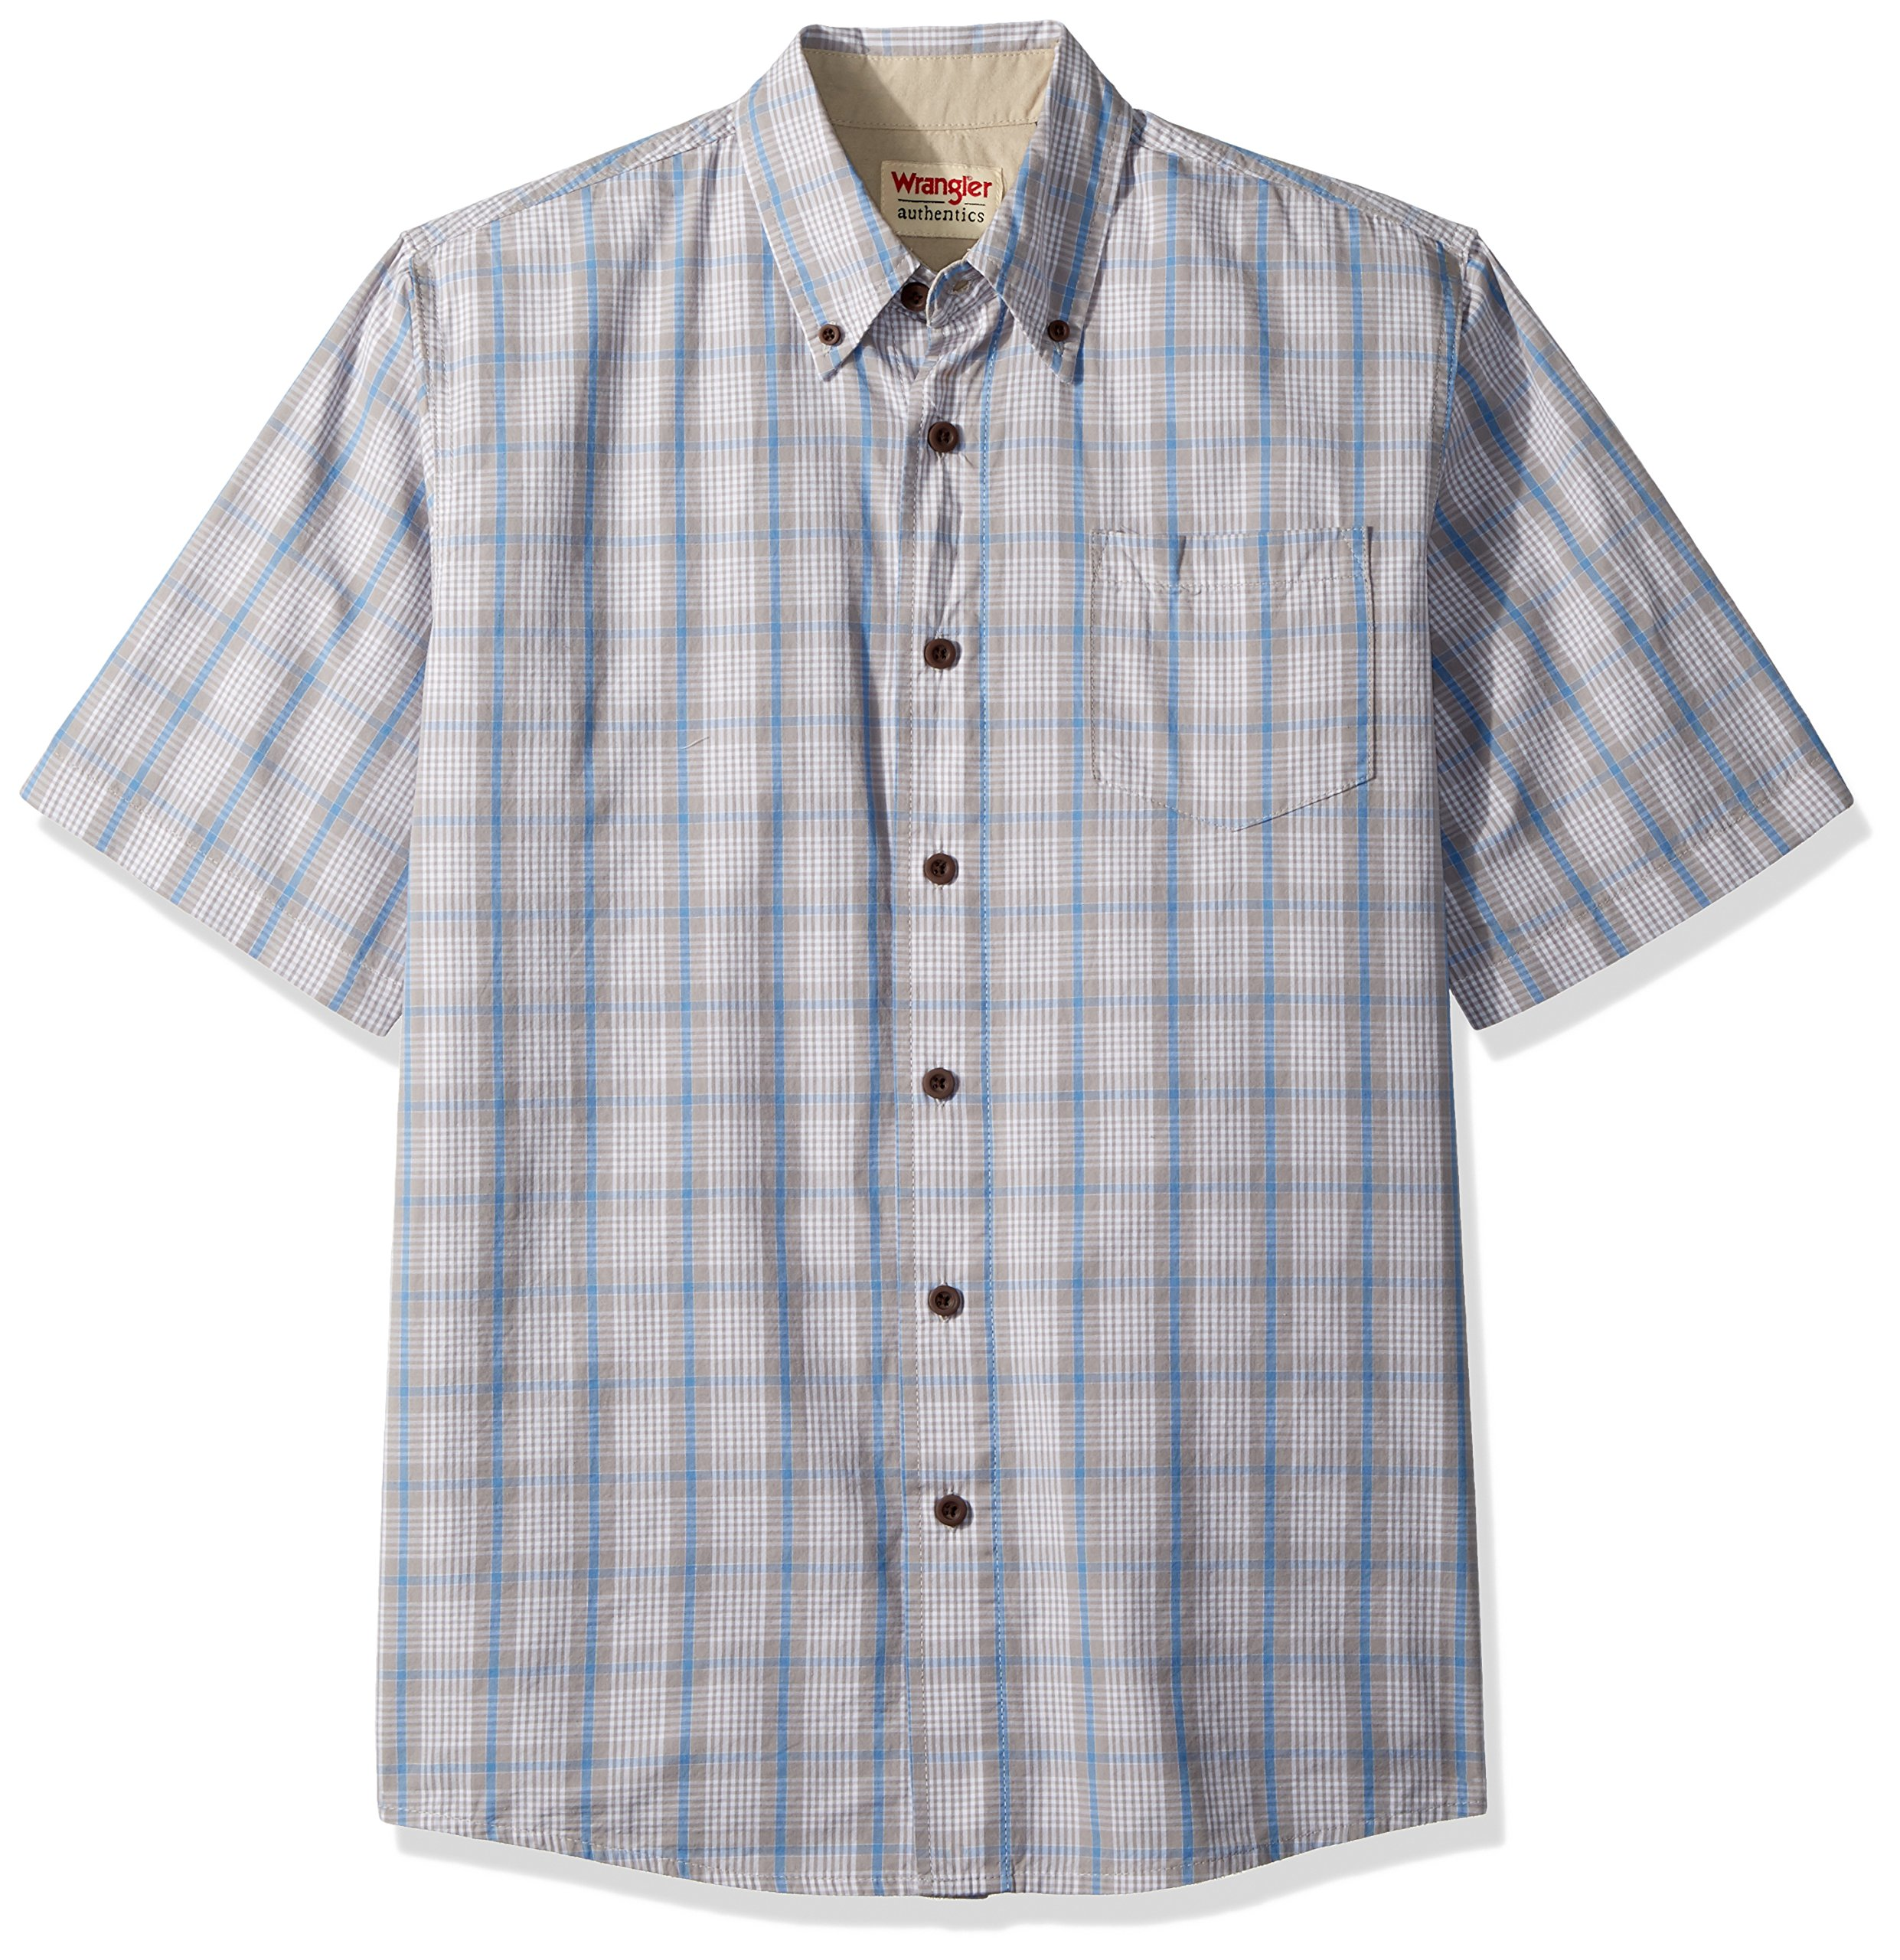 Wrangler Authentics Men's Short Sleeve Classic Plaid Shirt, Pumice Stone, M